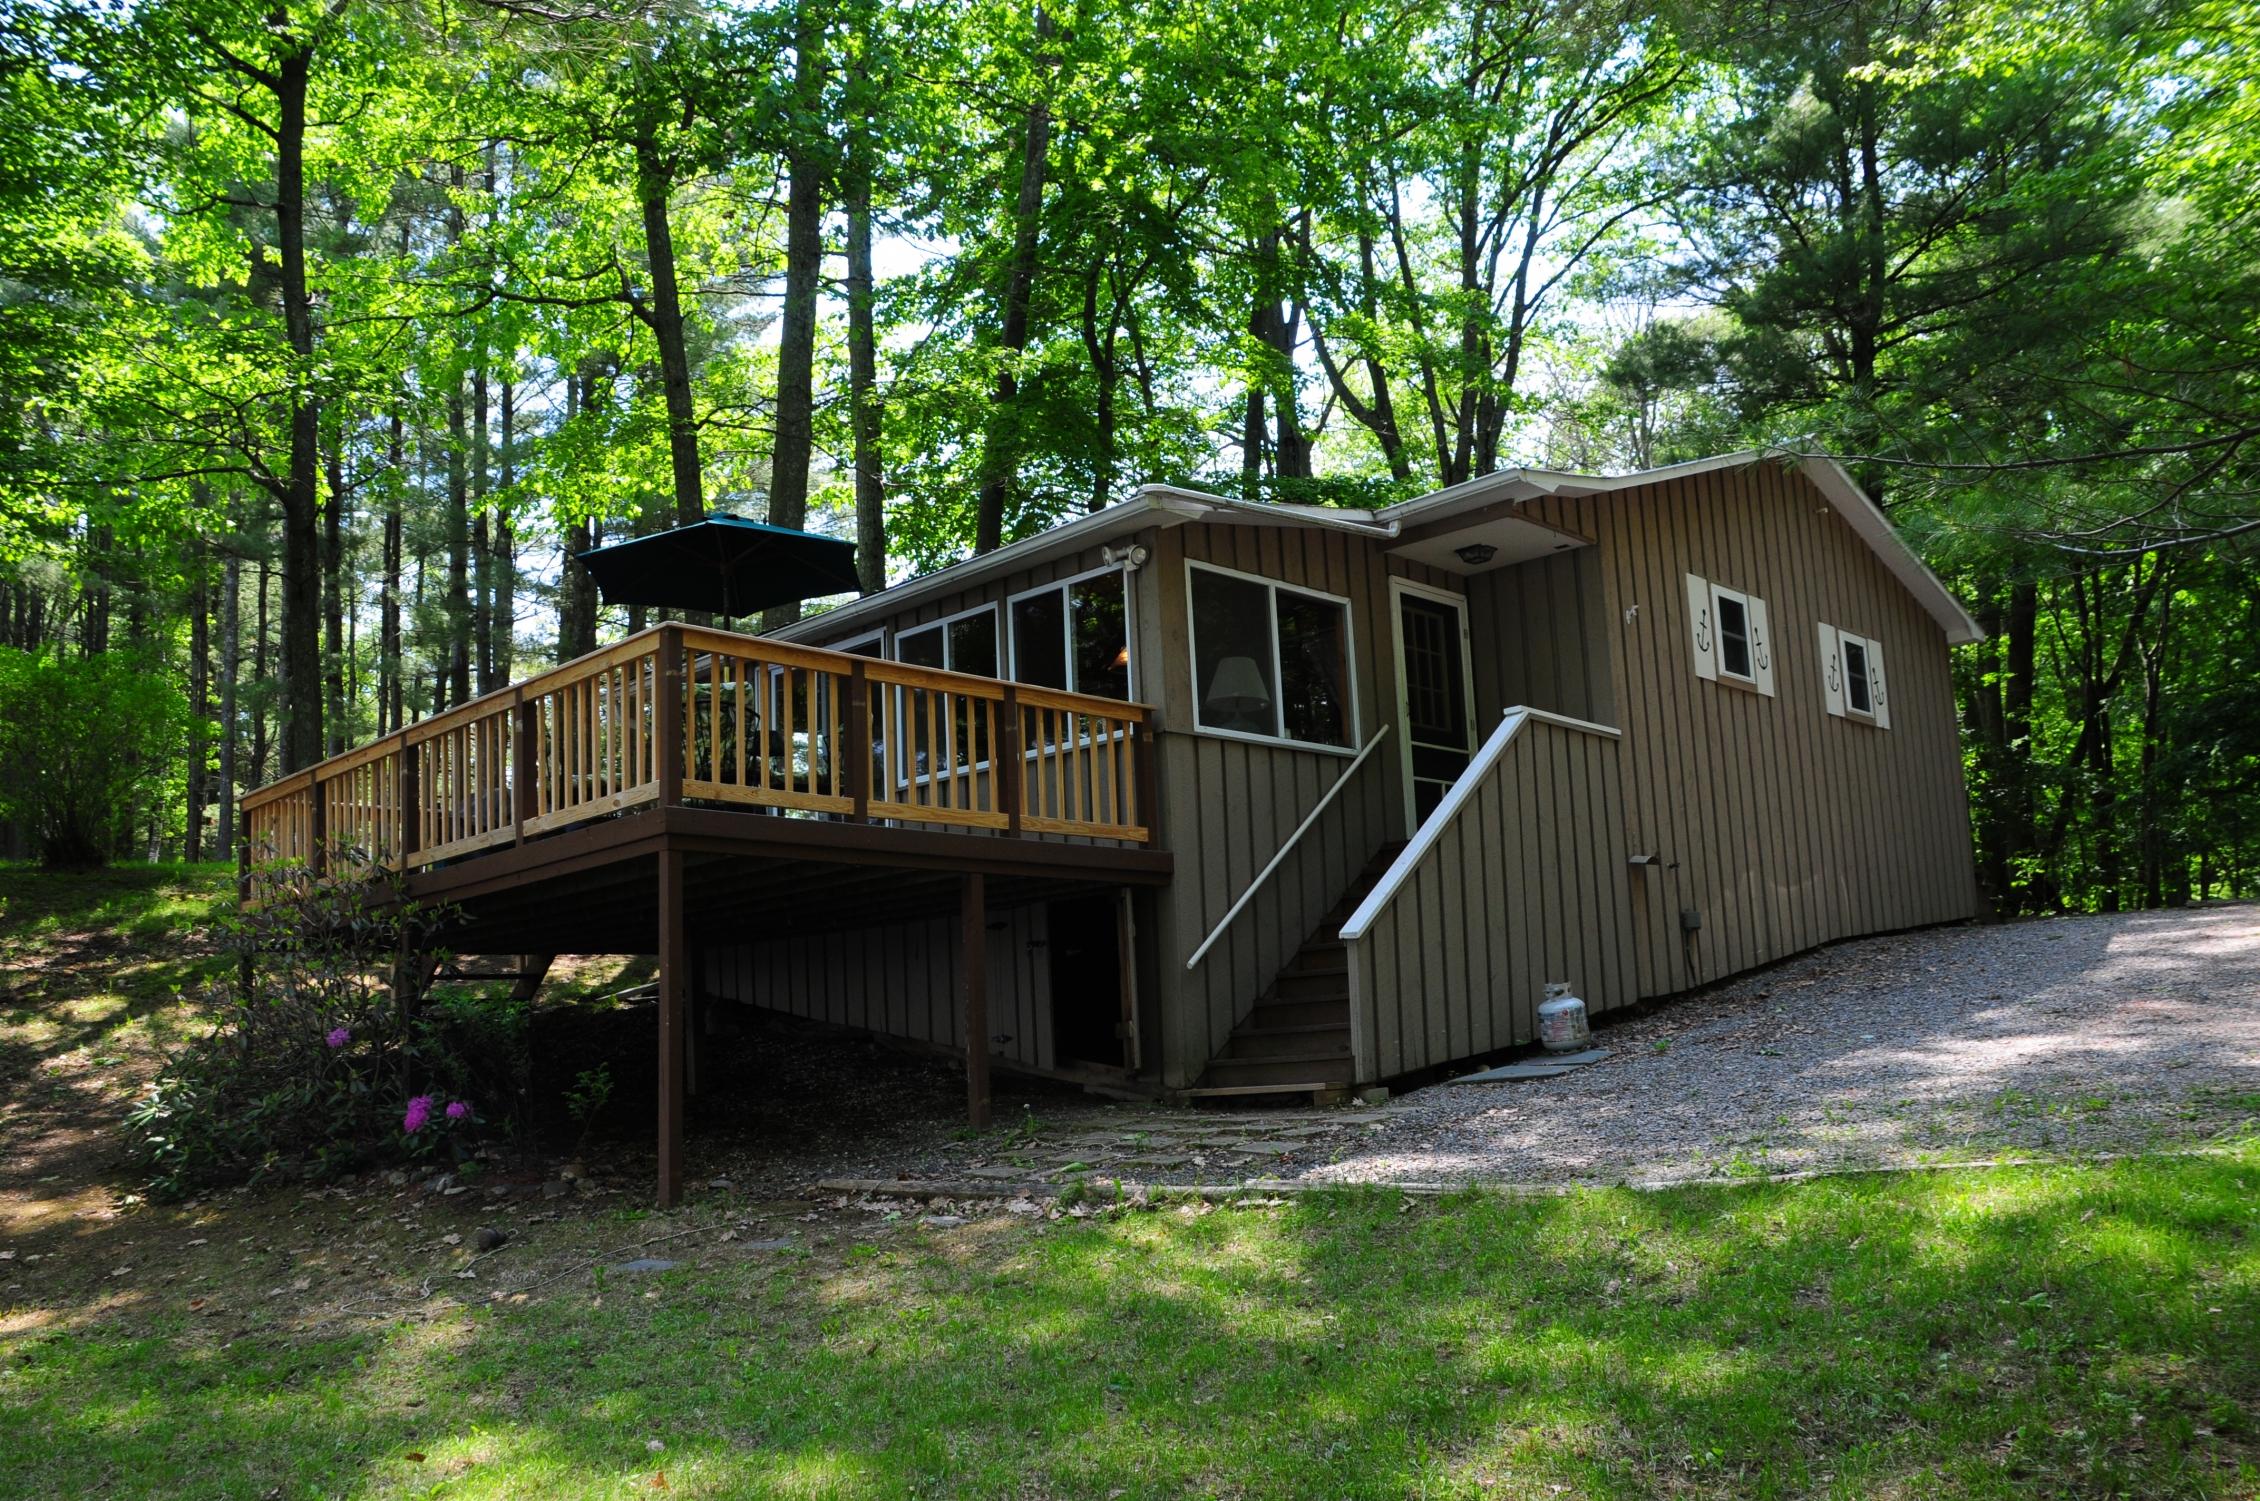 獨棟家庭住宅 為 出售 在 169 Cantell Road, Fairfield 169 Cantell Rd Fairfield, 佛蒙特州 05455 美國